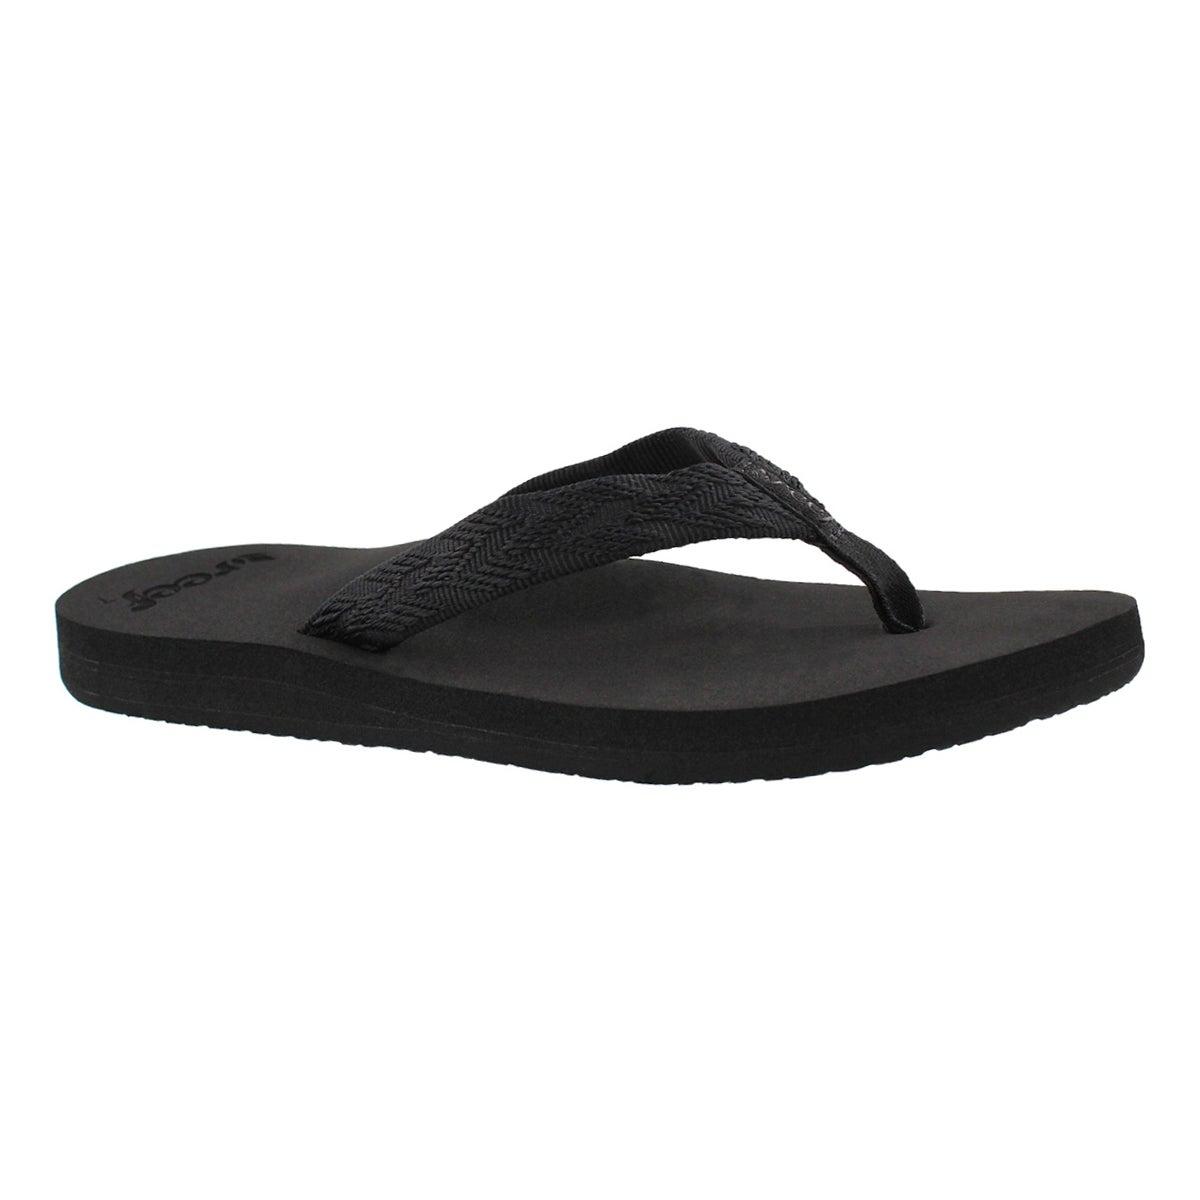 Women's MID SEAS black/black flip flops